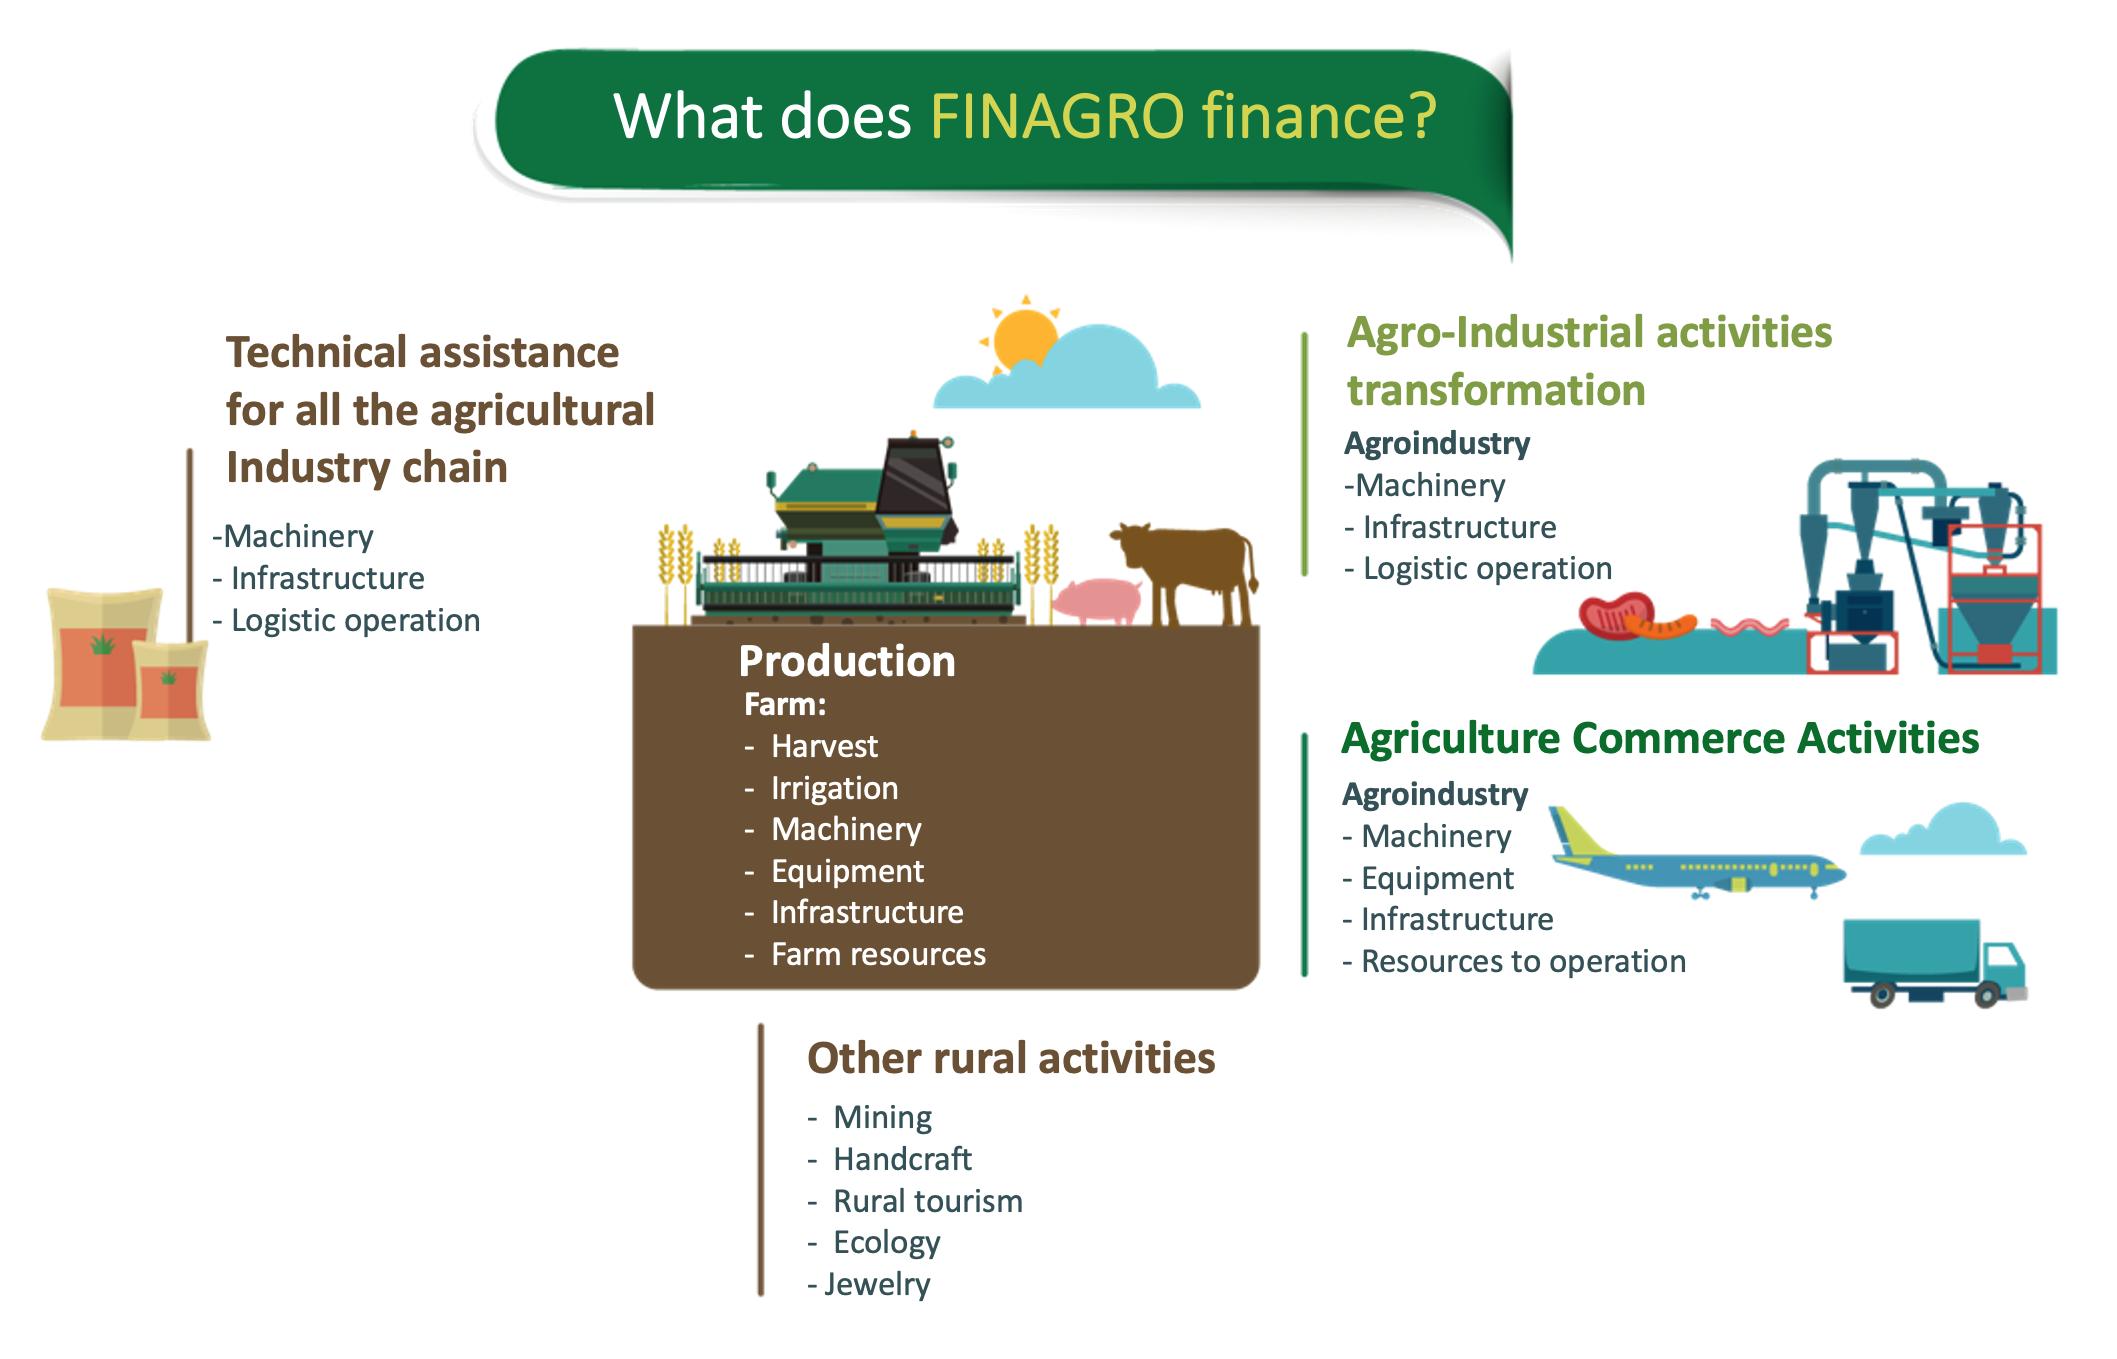 Finagro Finance